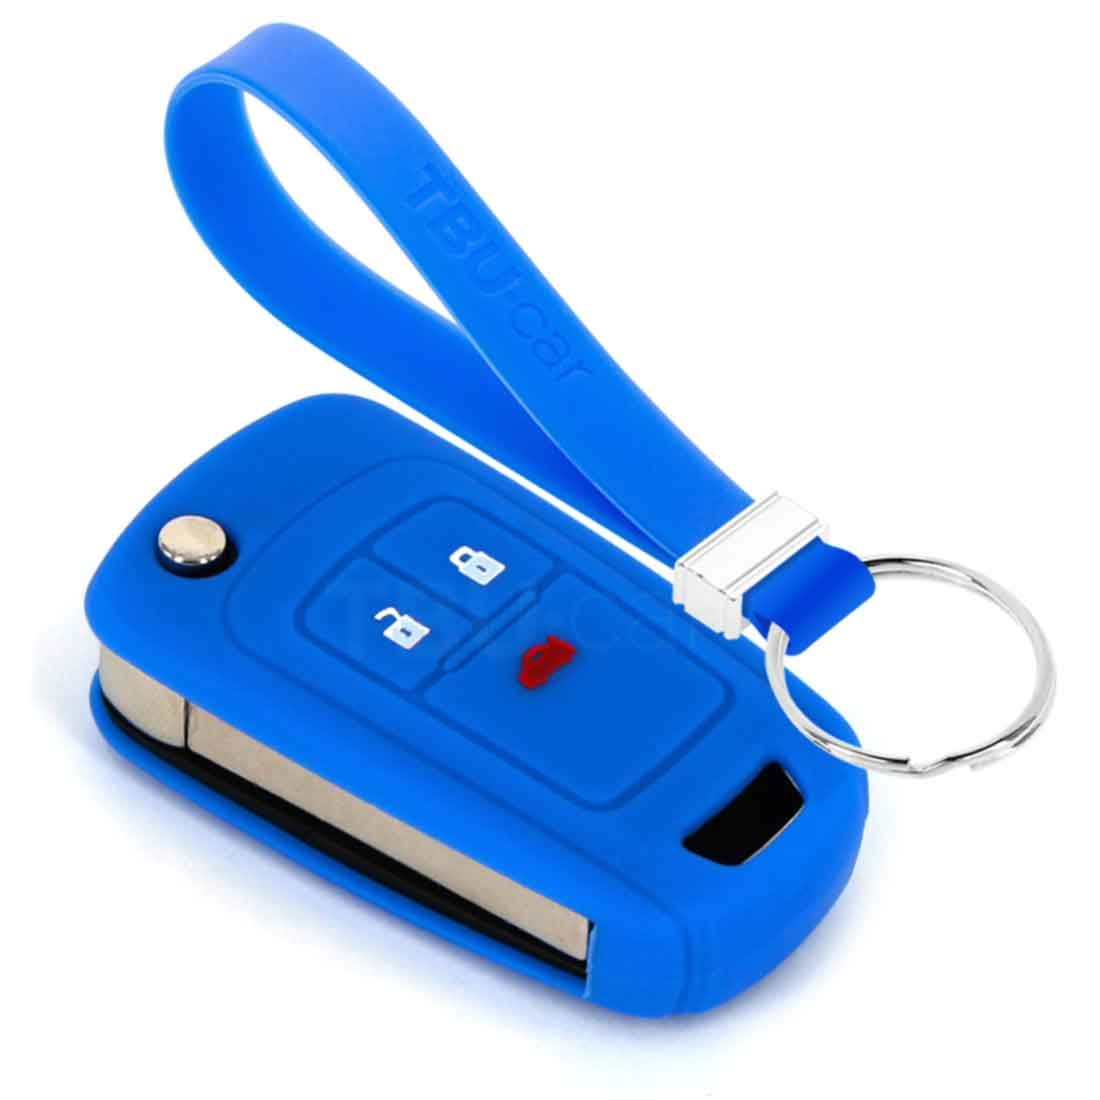 TBU car TBU car Funda Carcasa llave compatible con Chevrolet - Funda de Silicona - Cover de Llave Coche - Azul